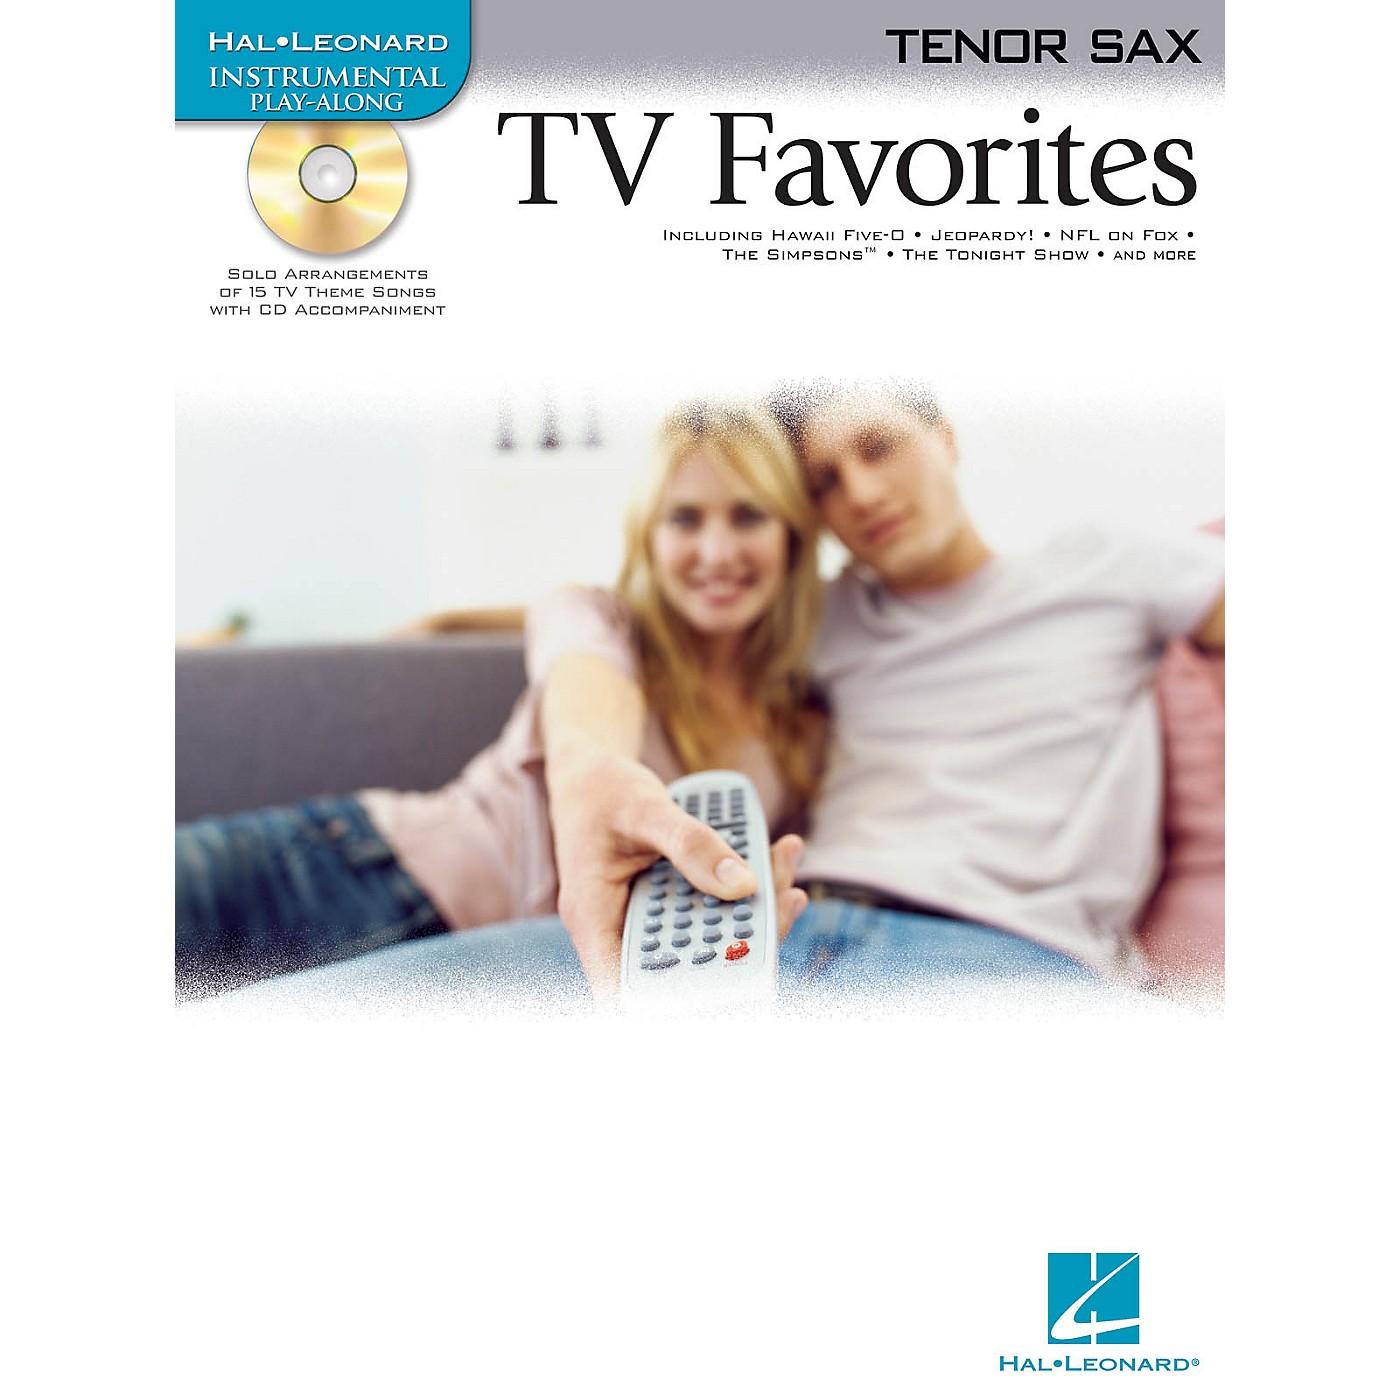 Hal Leonard TV Favorites (for Tenor Sax) Instrumental Play-Along Series Book with CD thumbnail